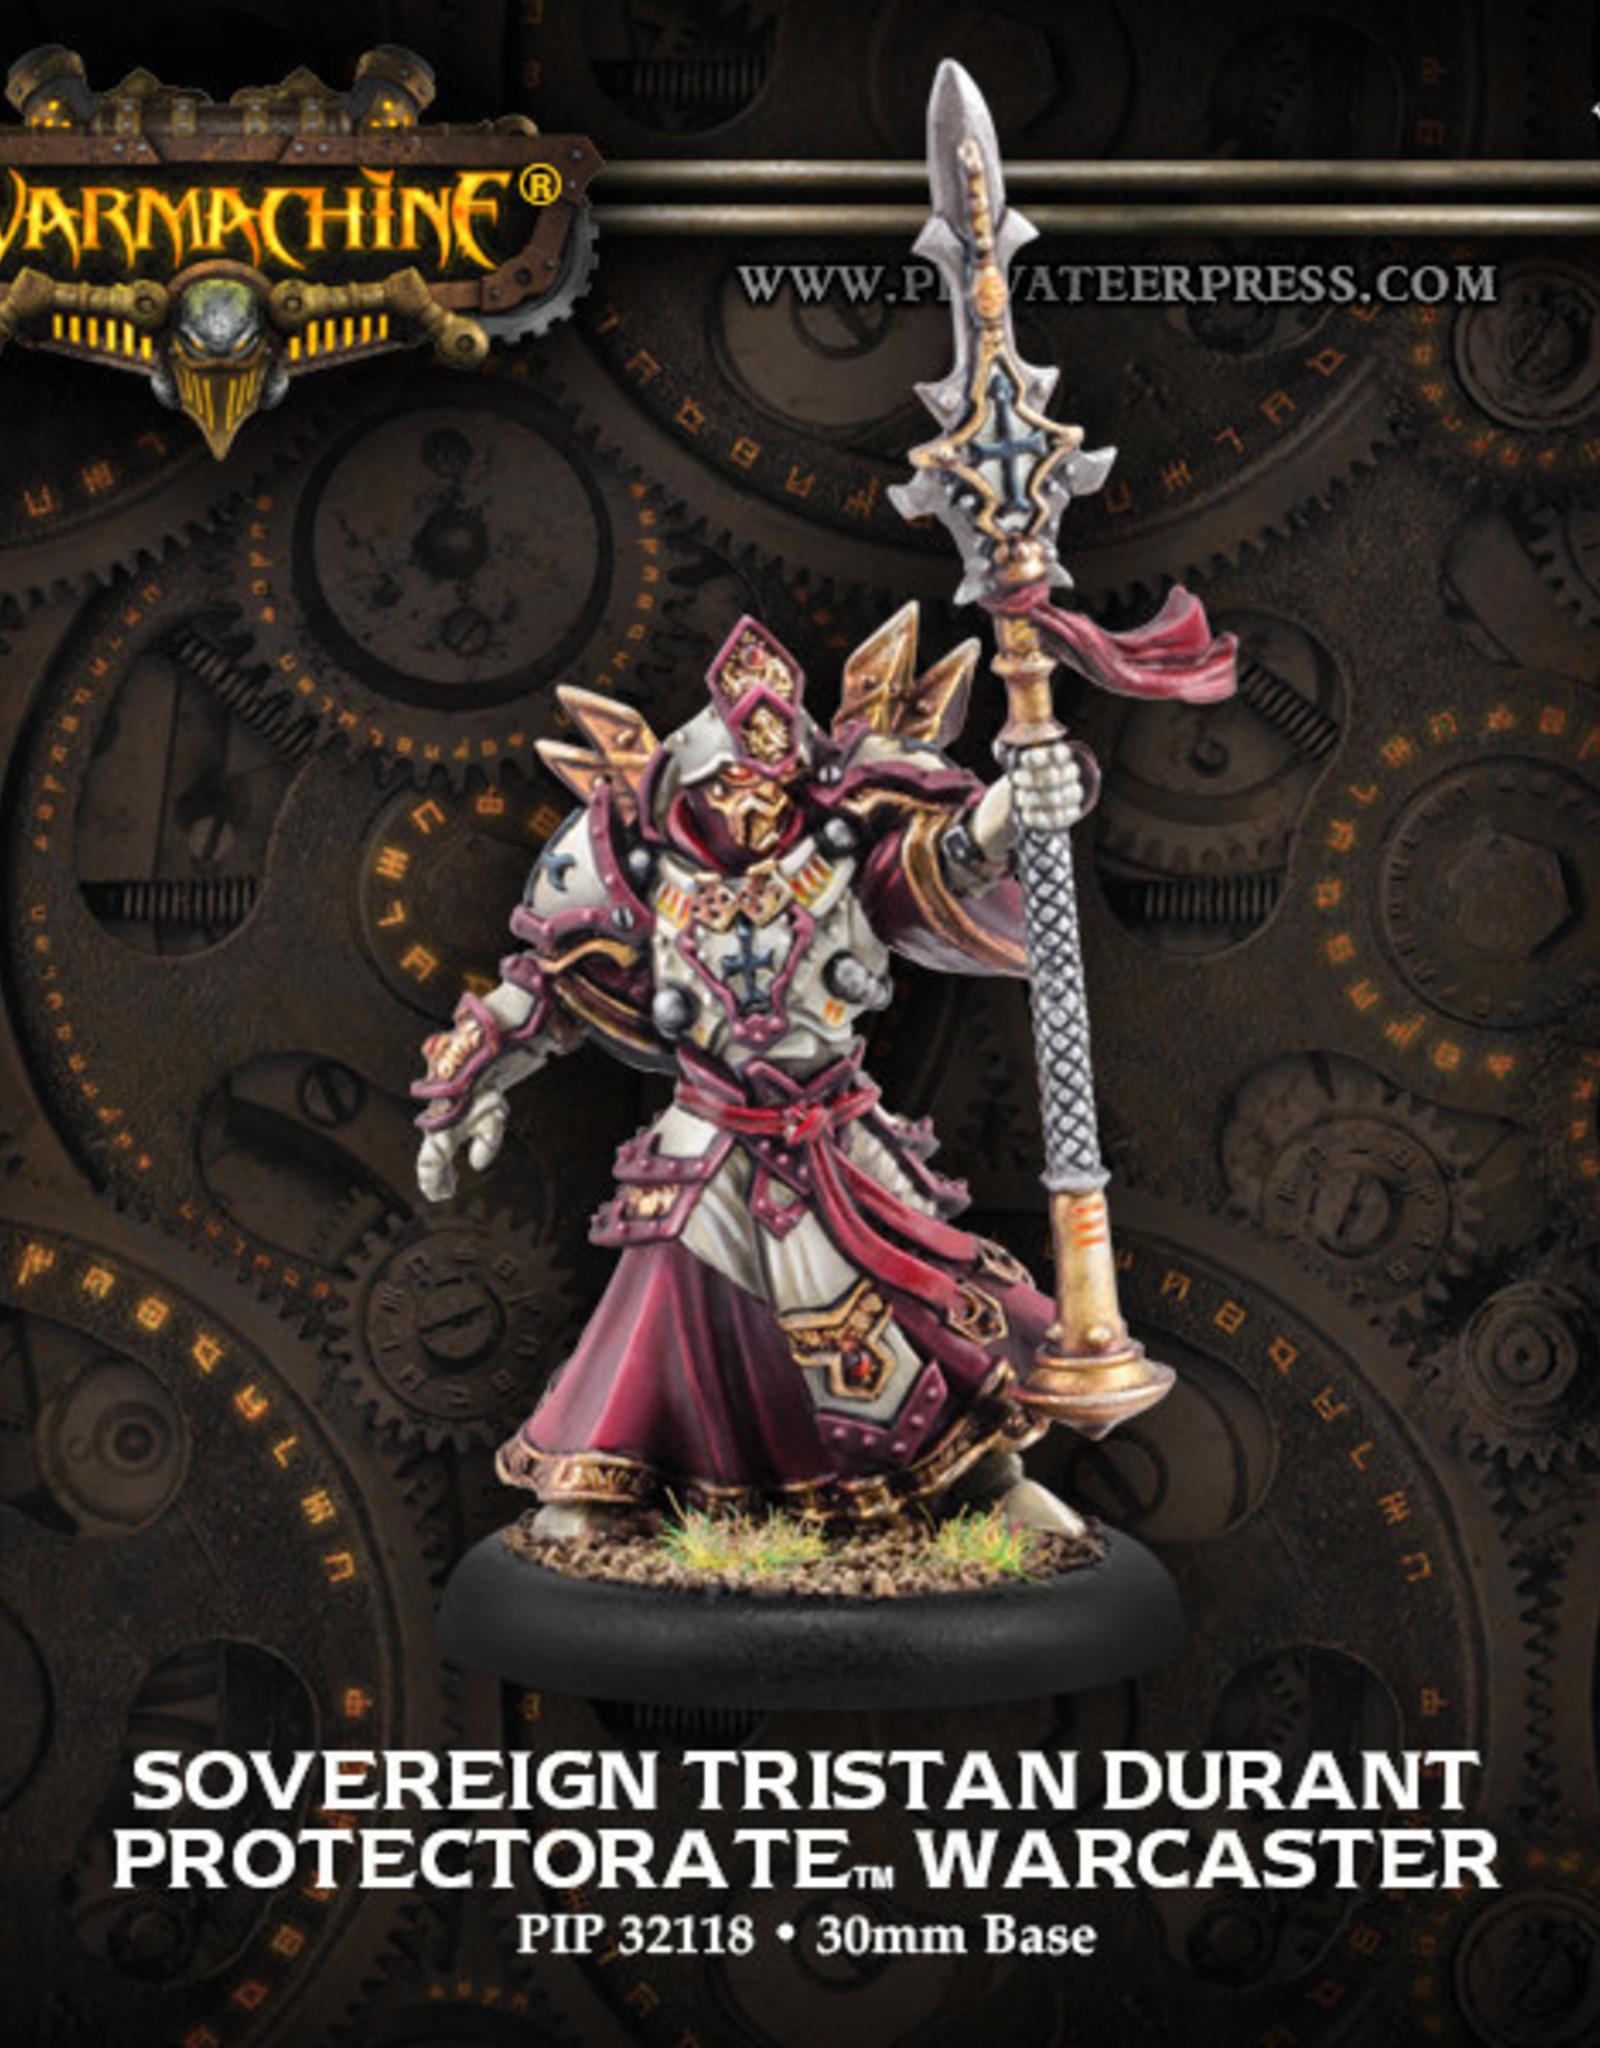 Warmachine Protectorate - Sovereign Tristan Durant